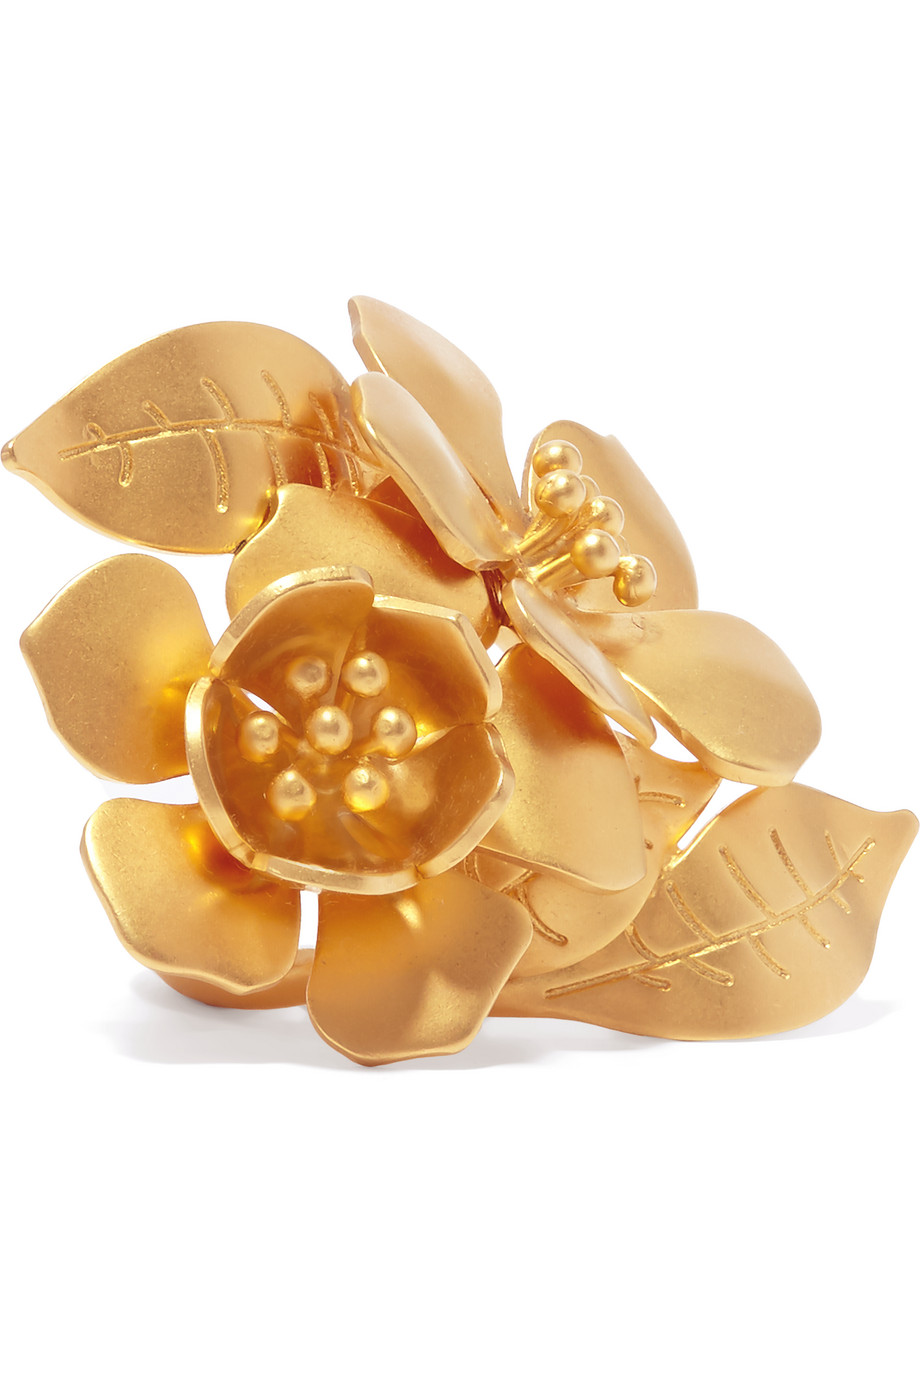 Valentino Gold-Tone Ring, Women's, Size: L